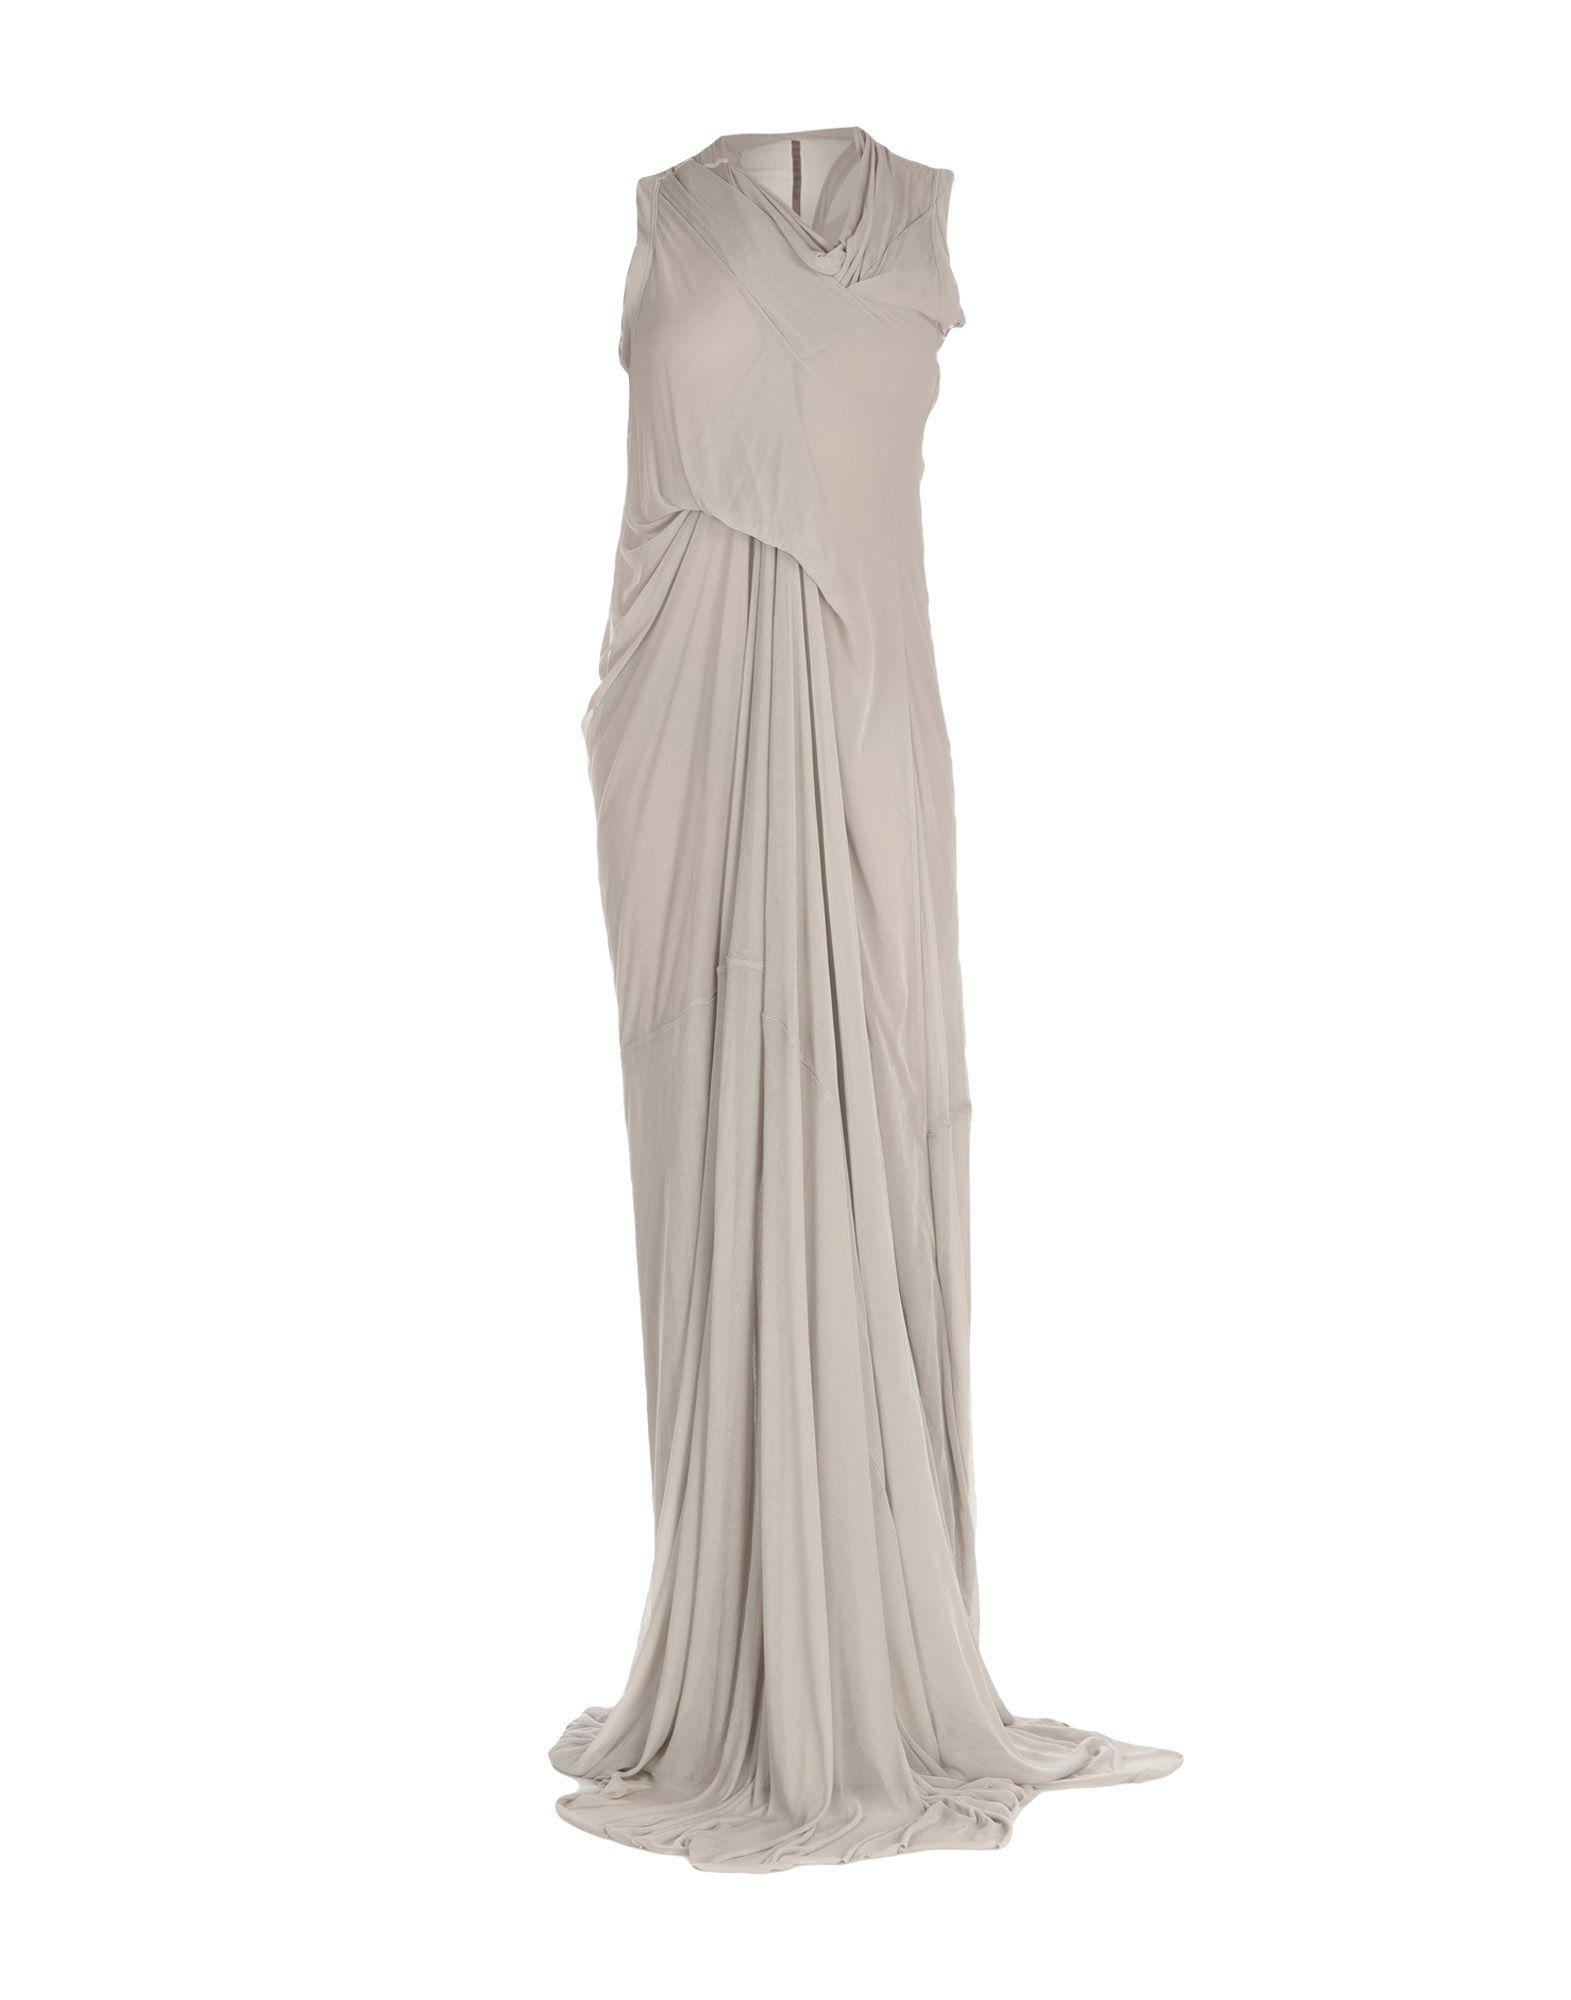 RICK OWENS LILIES Длинное платье длинное платье с узорами lamiavita